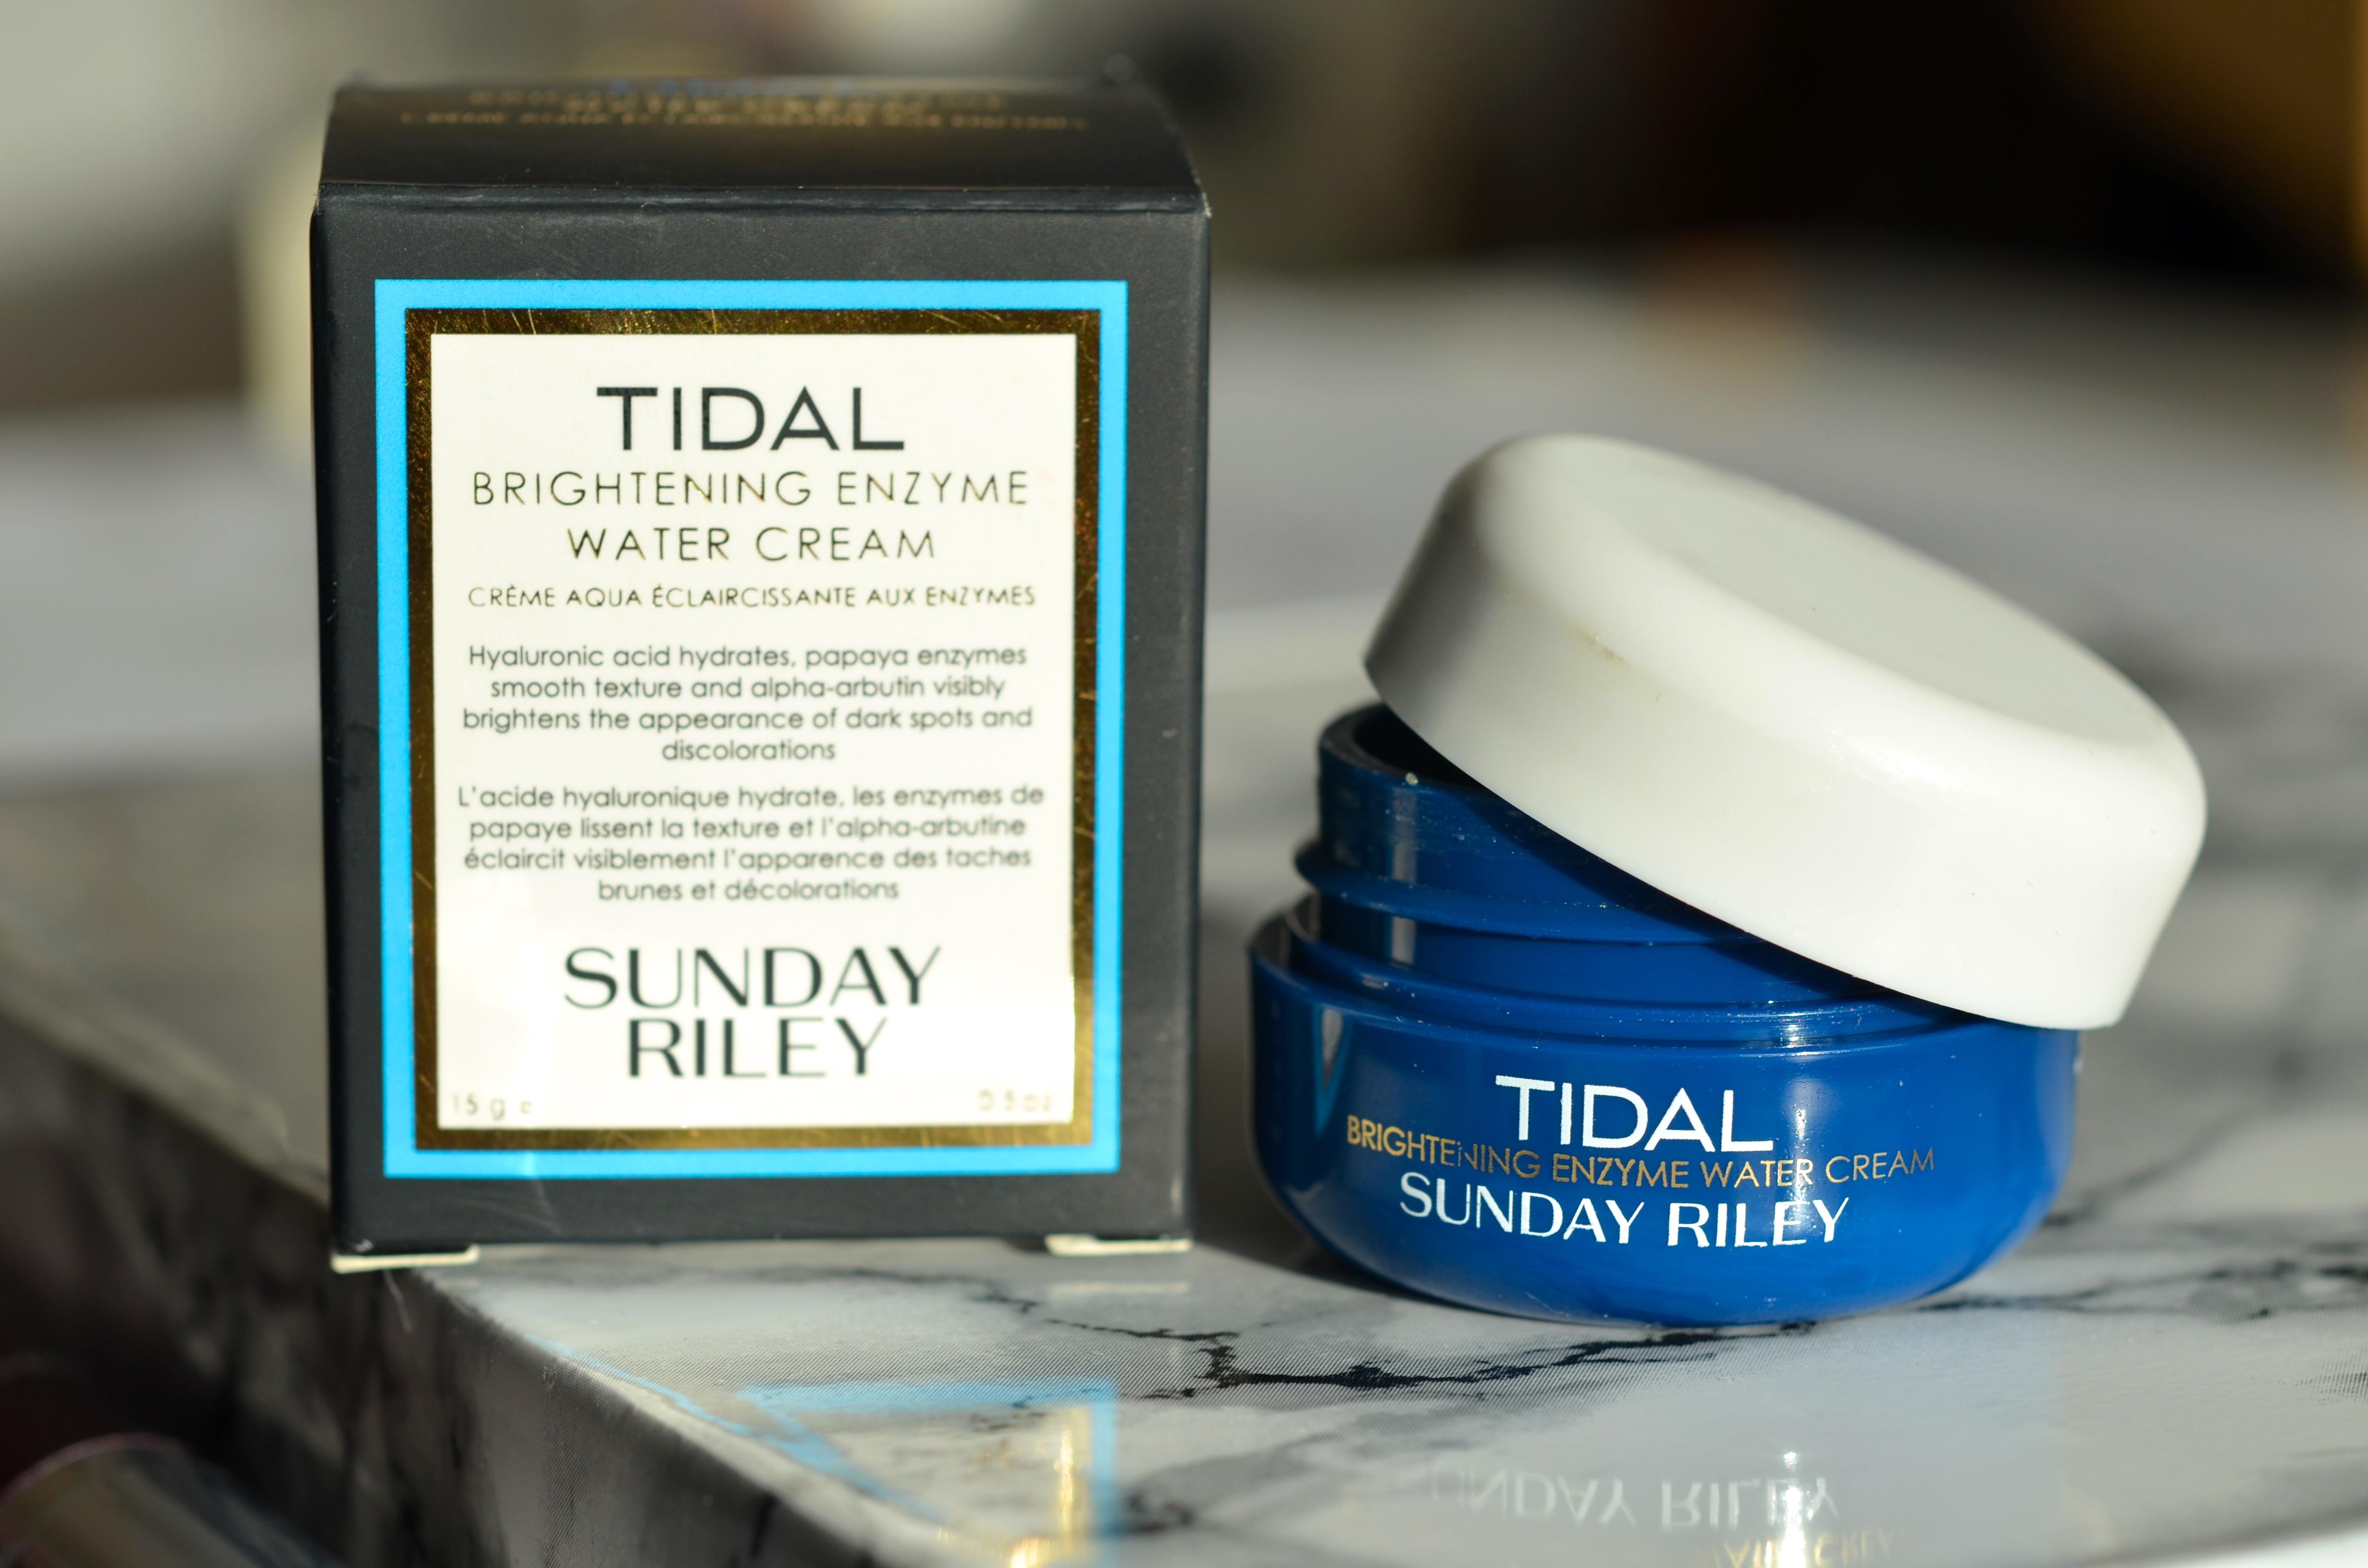 sunday-riley-tidal-brightening-enzyme-water-cream